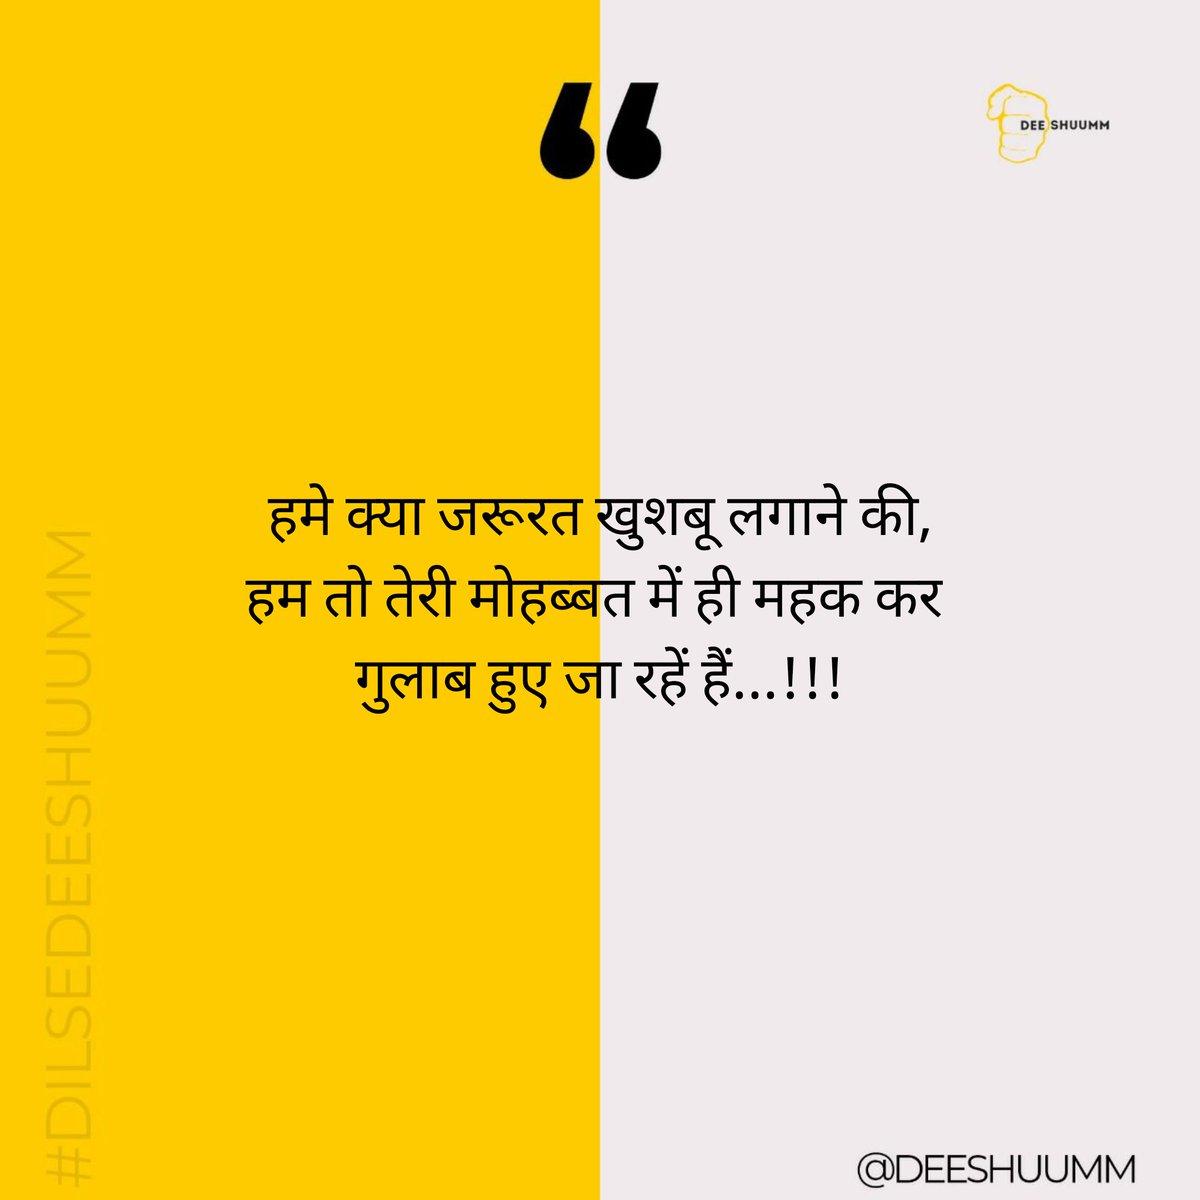 if you feel Connected RT Now! #shayari #love #poetry #urdu #urdupoetry #shayarilover #hindi #shayar #quotes #hindishayari #lovequotes #rekhta #follow #urdushayari #loveshayari #hindipoetry #ishq #poet #like  #shayri #poetrycommunity #instashayari #sad #poem #mohabbat #deeshuummpic.twitter.com/7qH5AbhJ8s